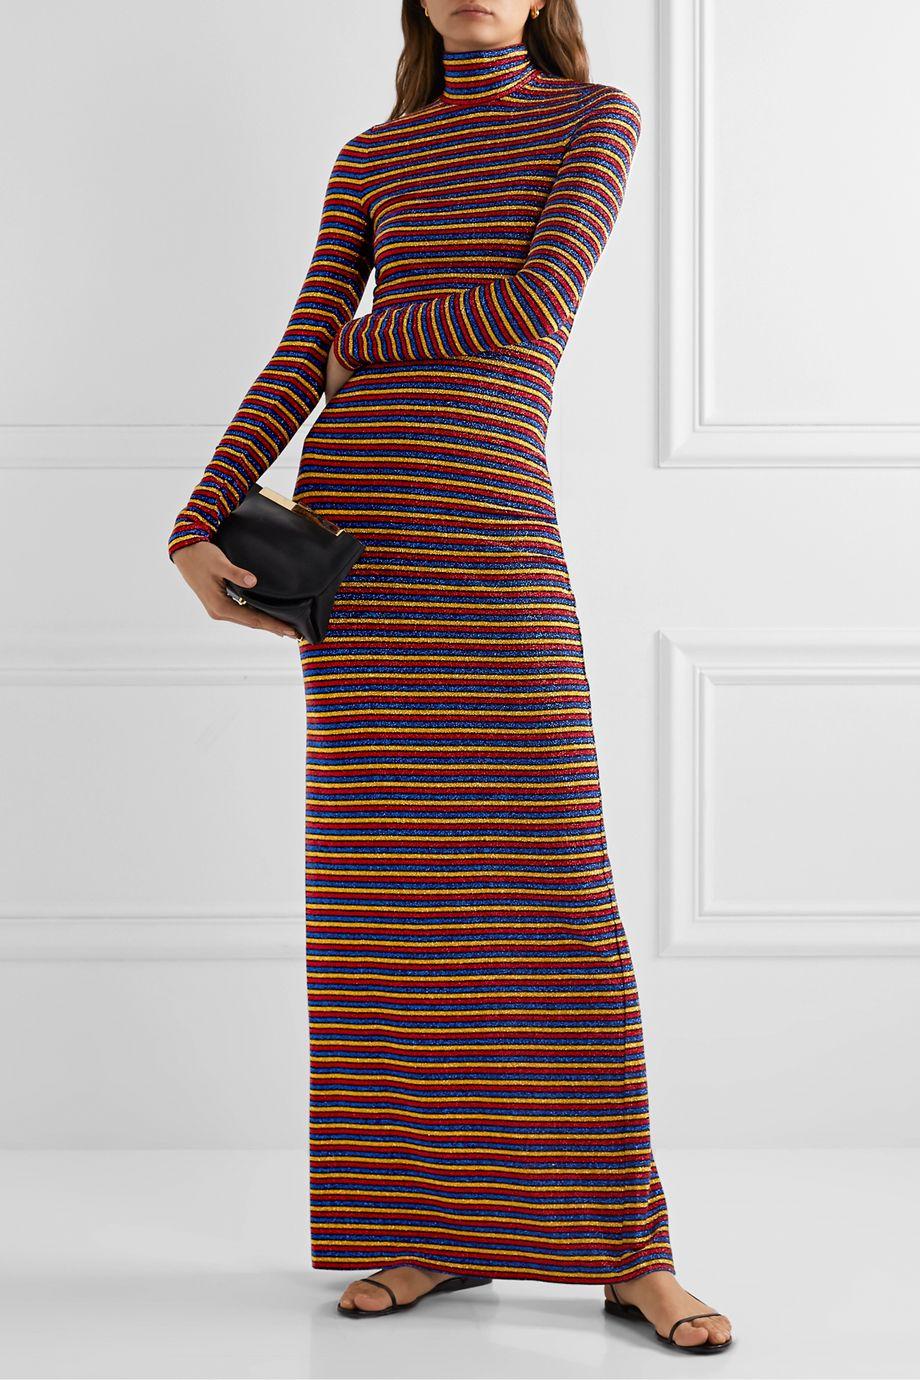 Rosetta Getty Metallic striped stretch-knit turtleneck maxi dress